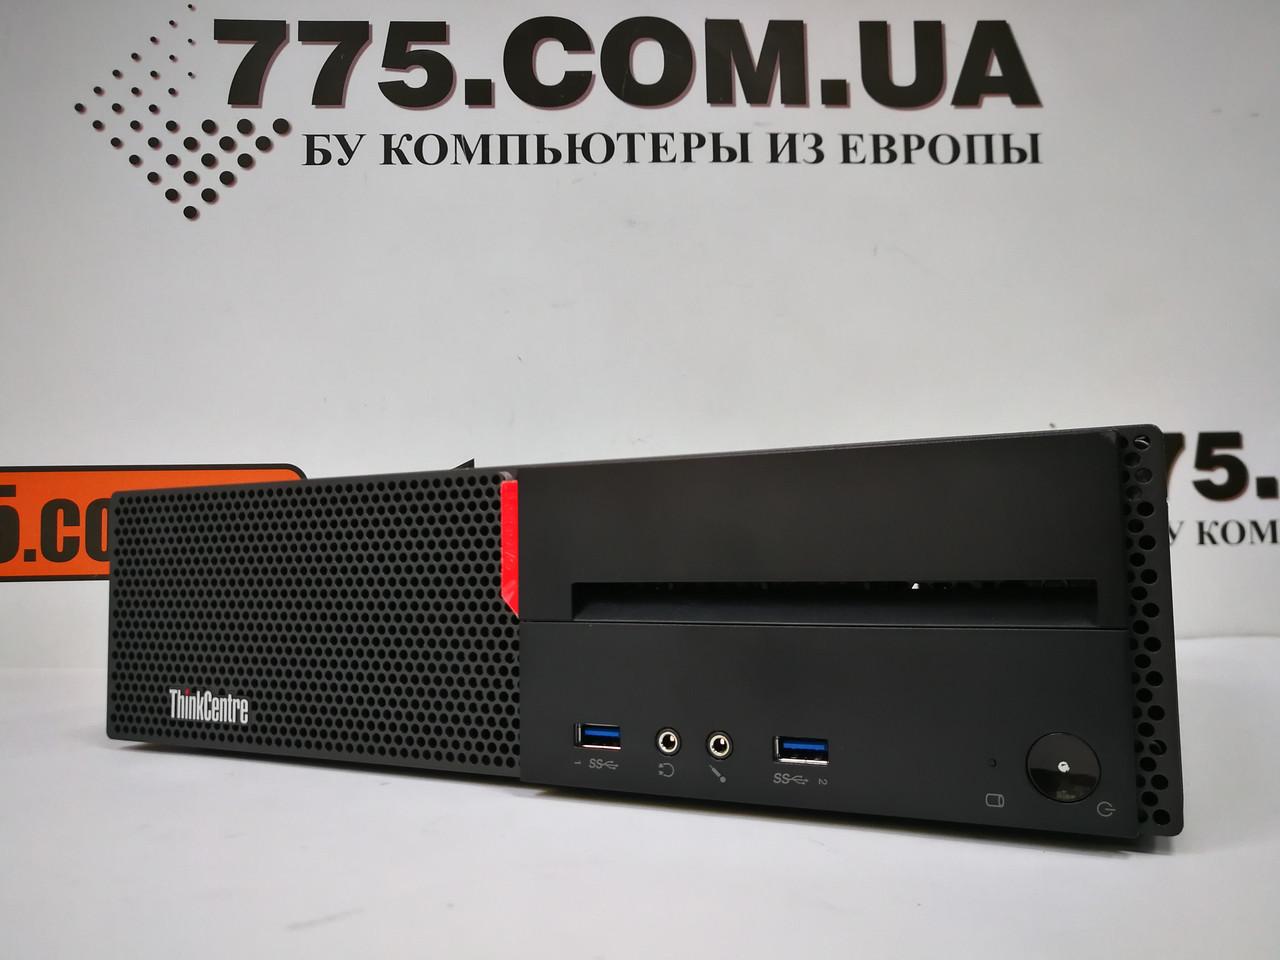 Компьютер Lenovo M700, Intel Core i3-6100 3.7GHz, RAM 4ГБ DDR4, SSD 120ГБ (SSHD 500ГБ), Windows 10 Pro